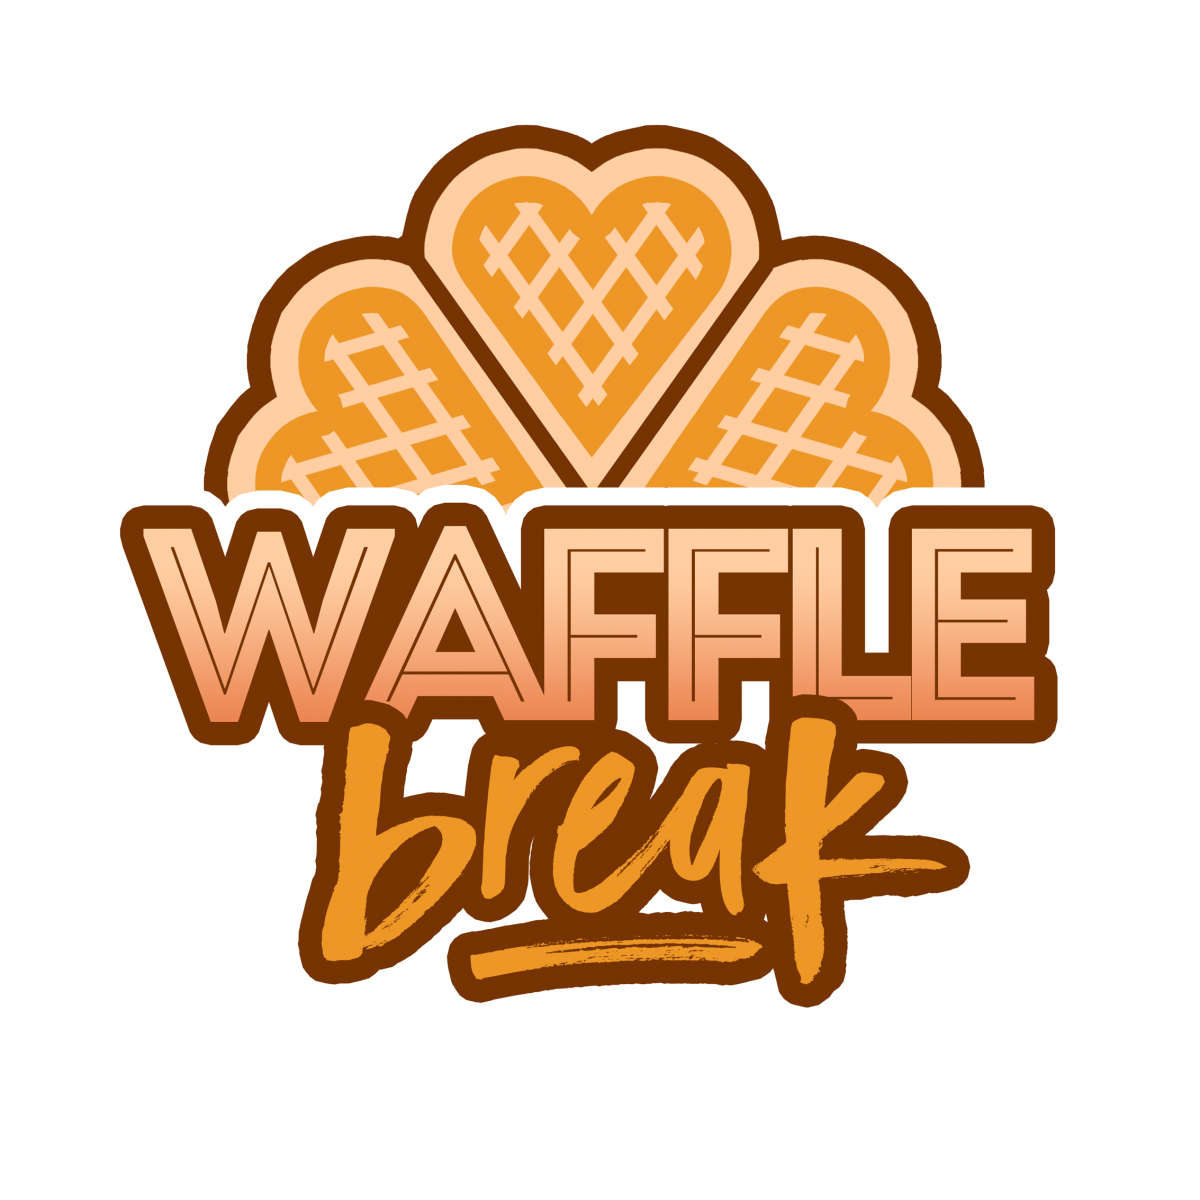 waffle break - logo complet - png